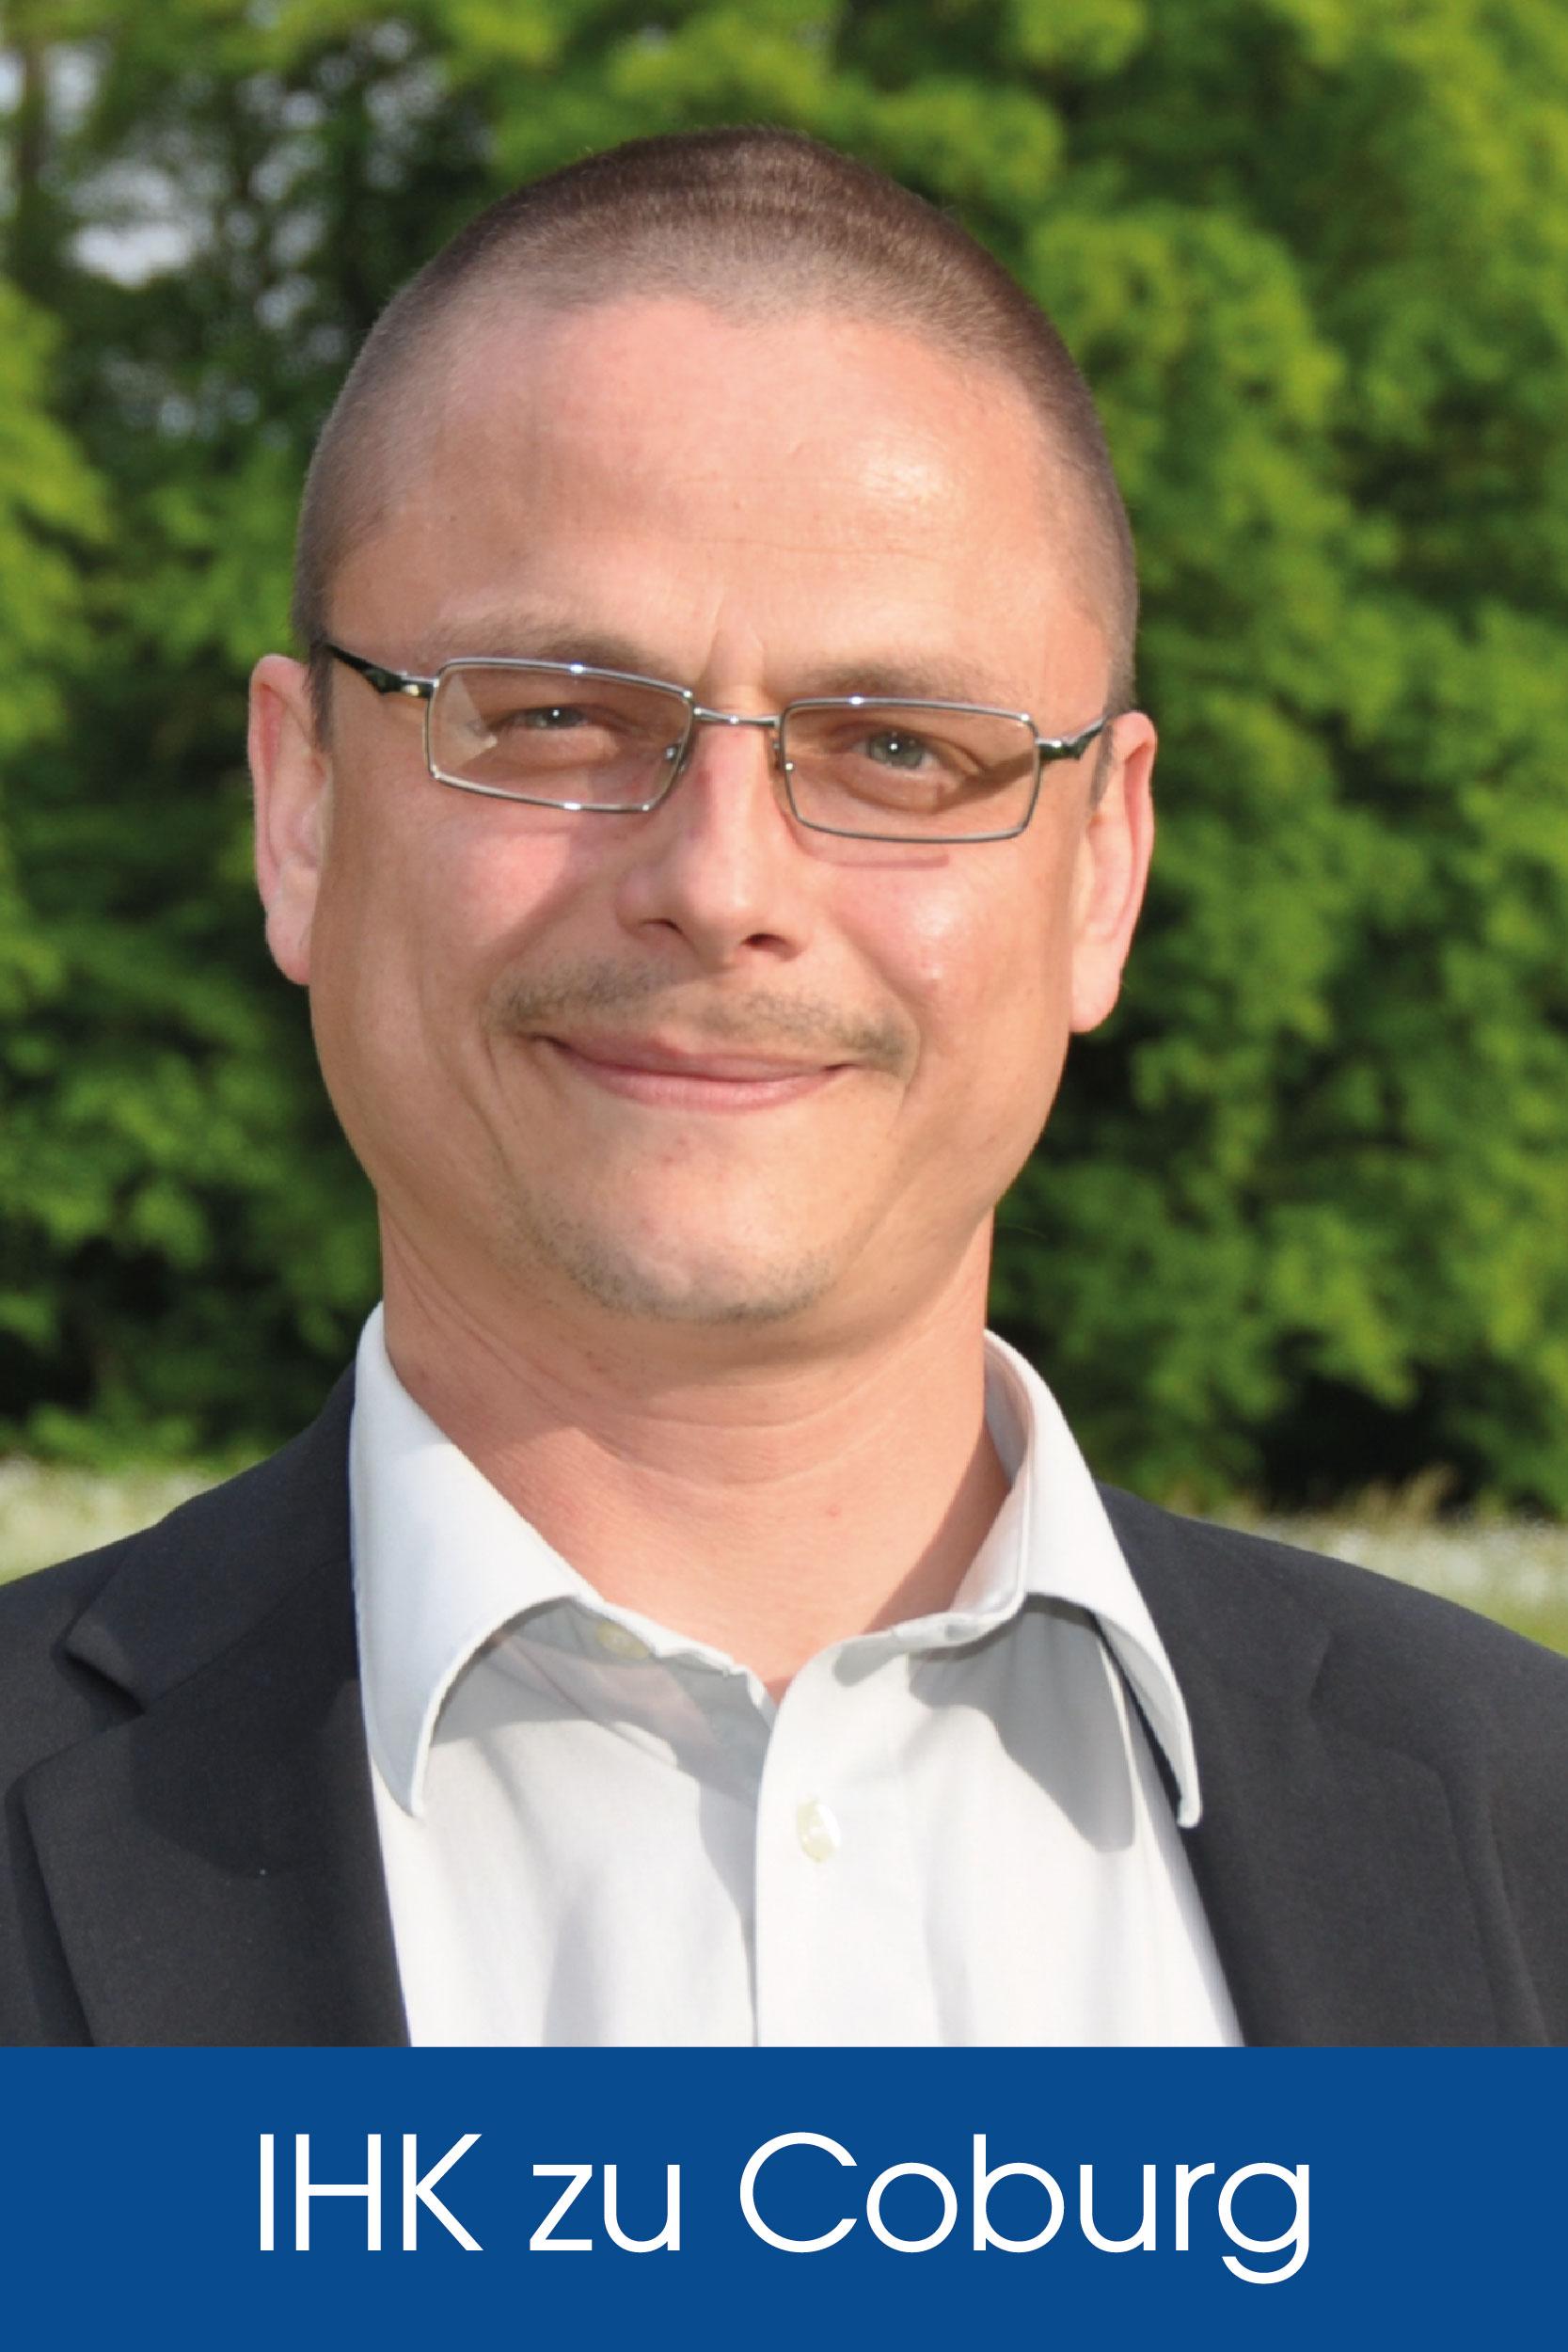 Christian_Broßmann